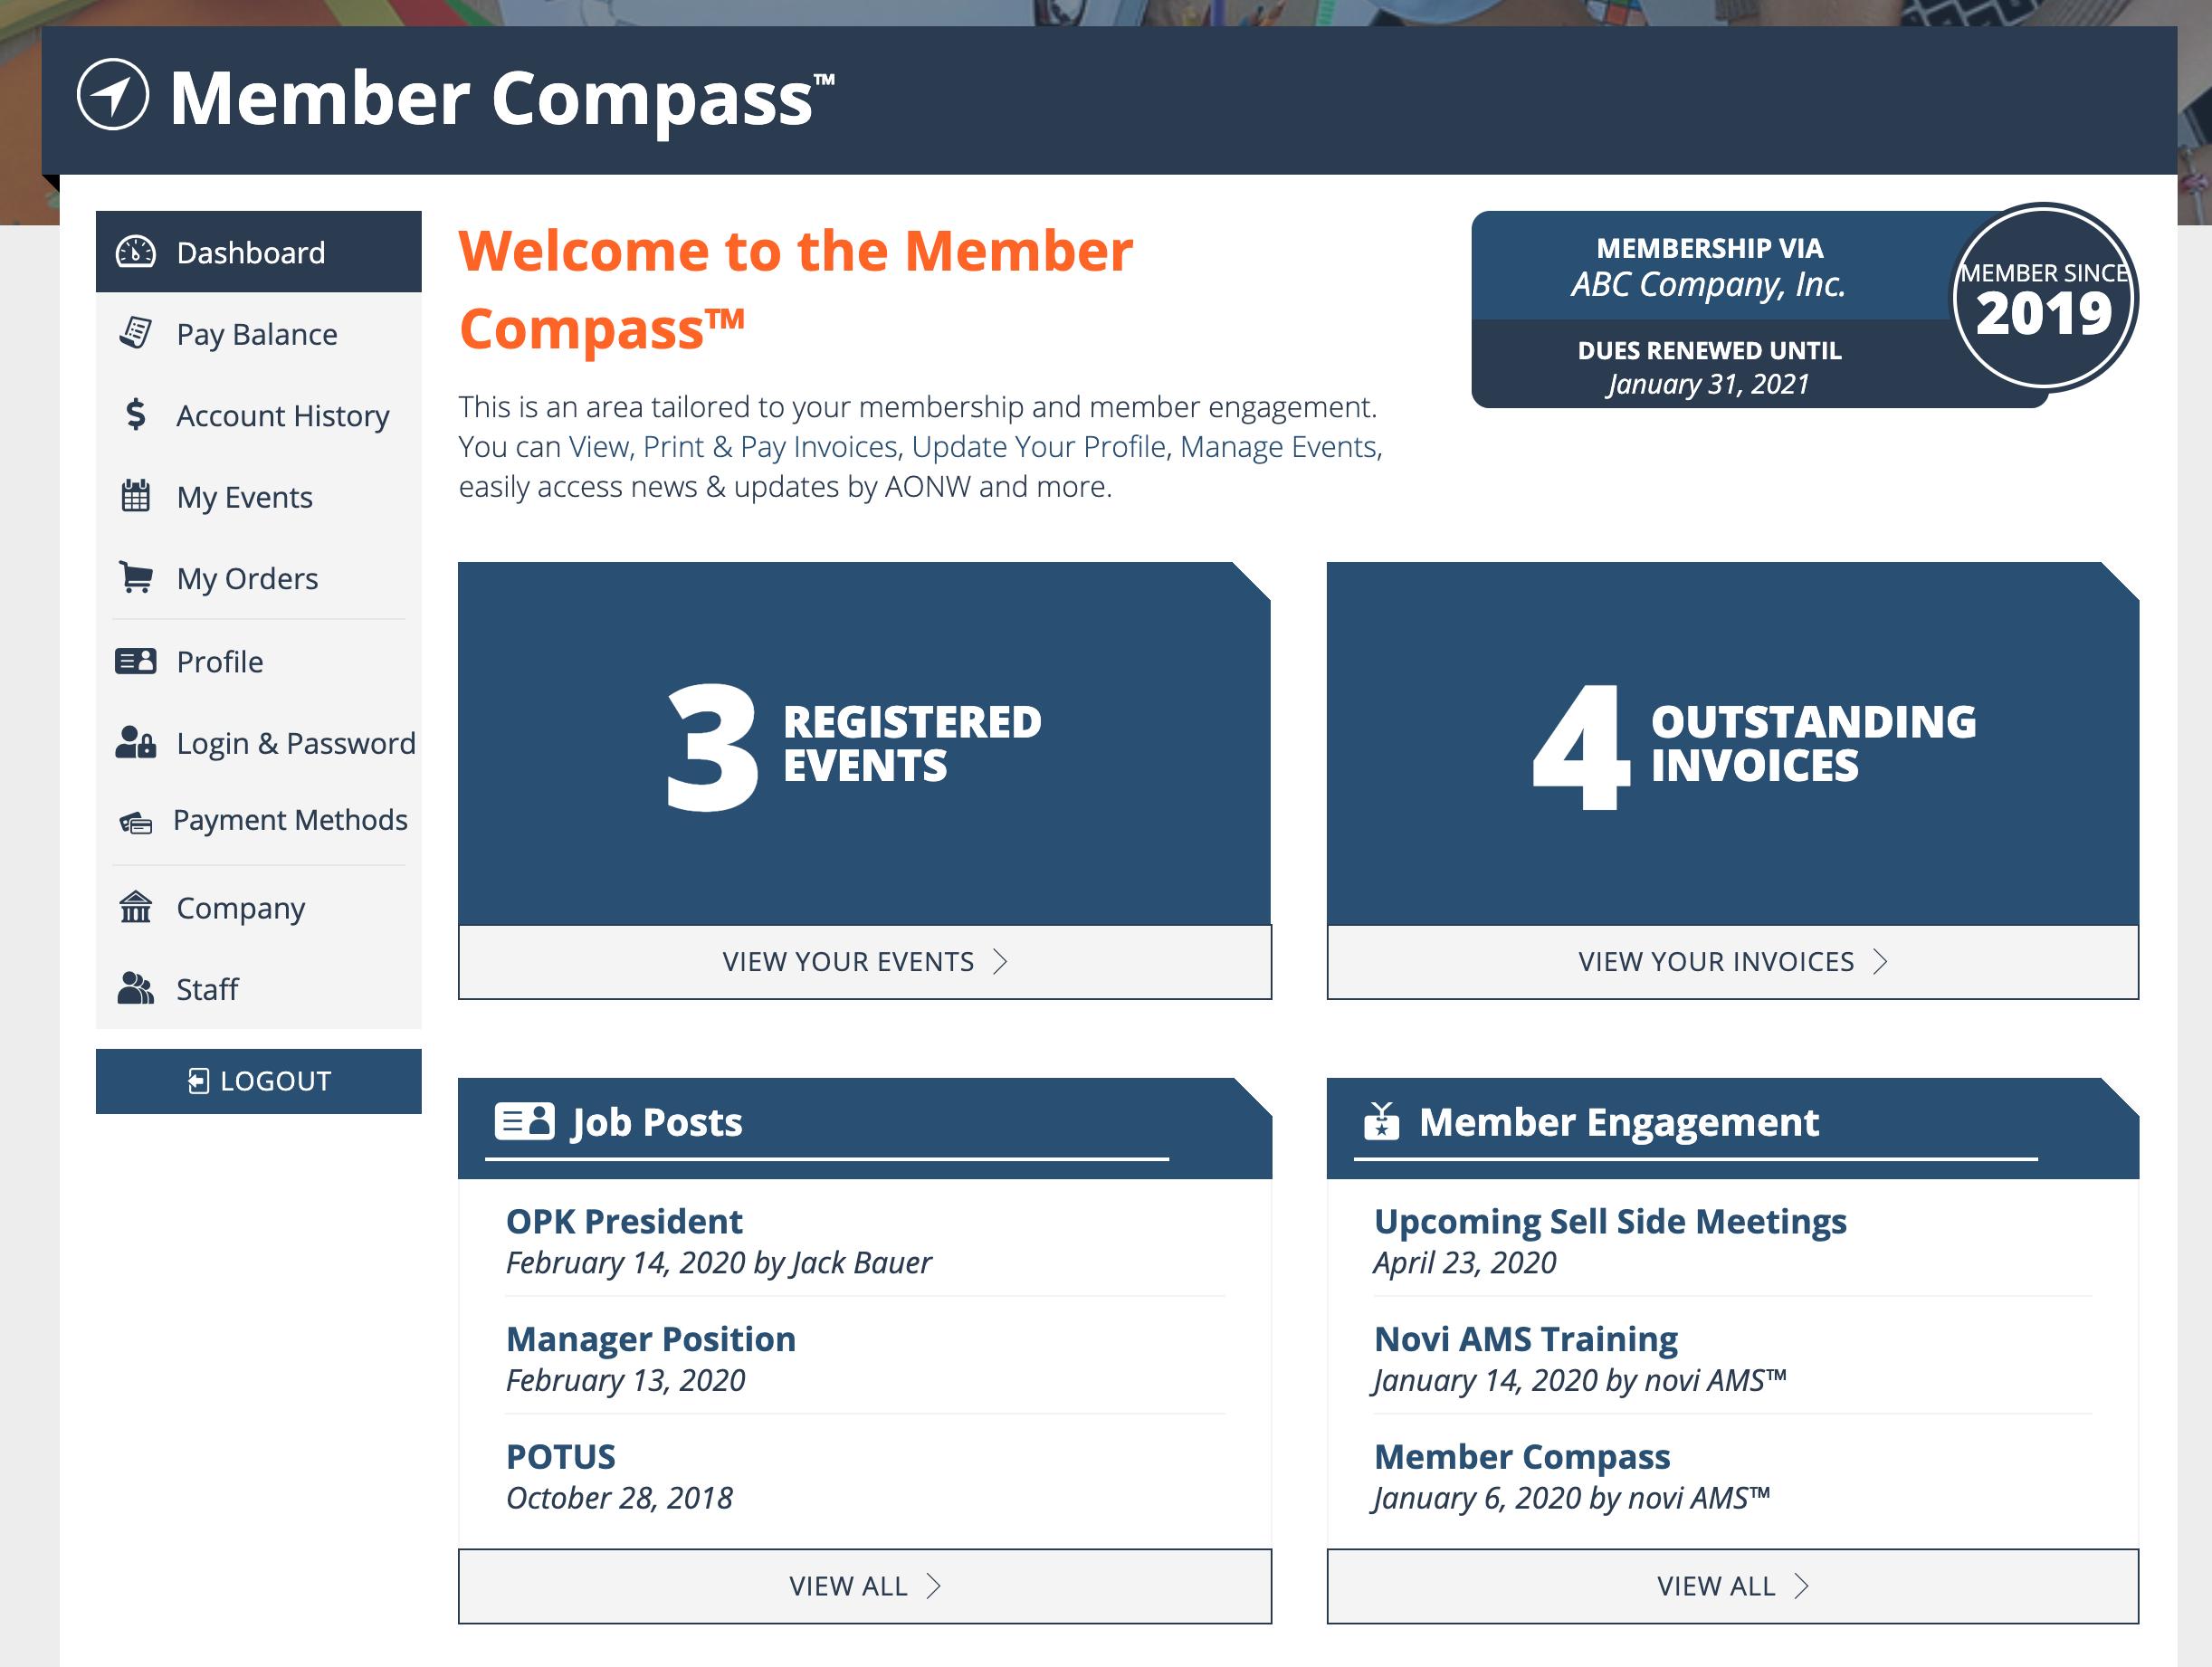 Member Compass Dashboard